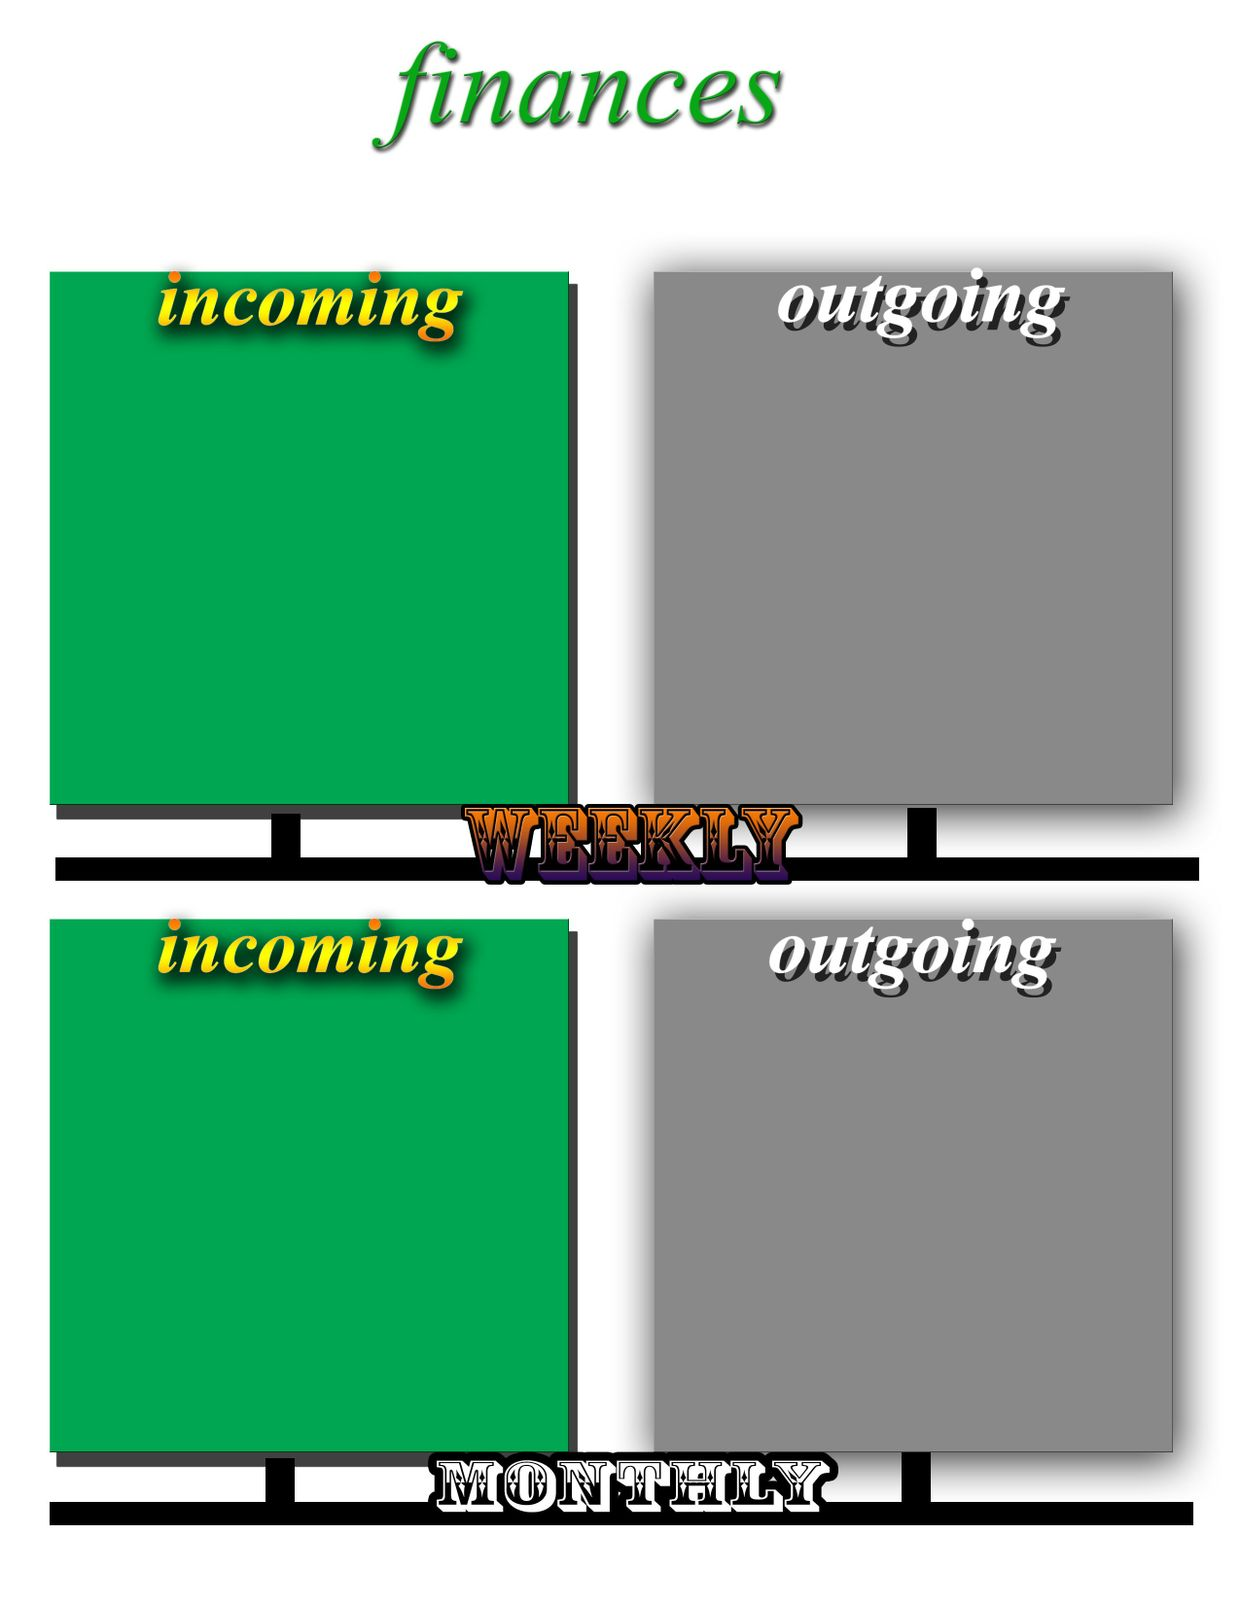 Finances planning image